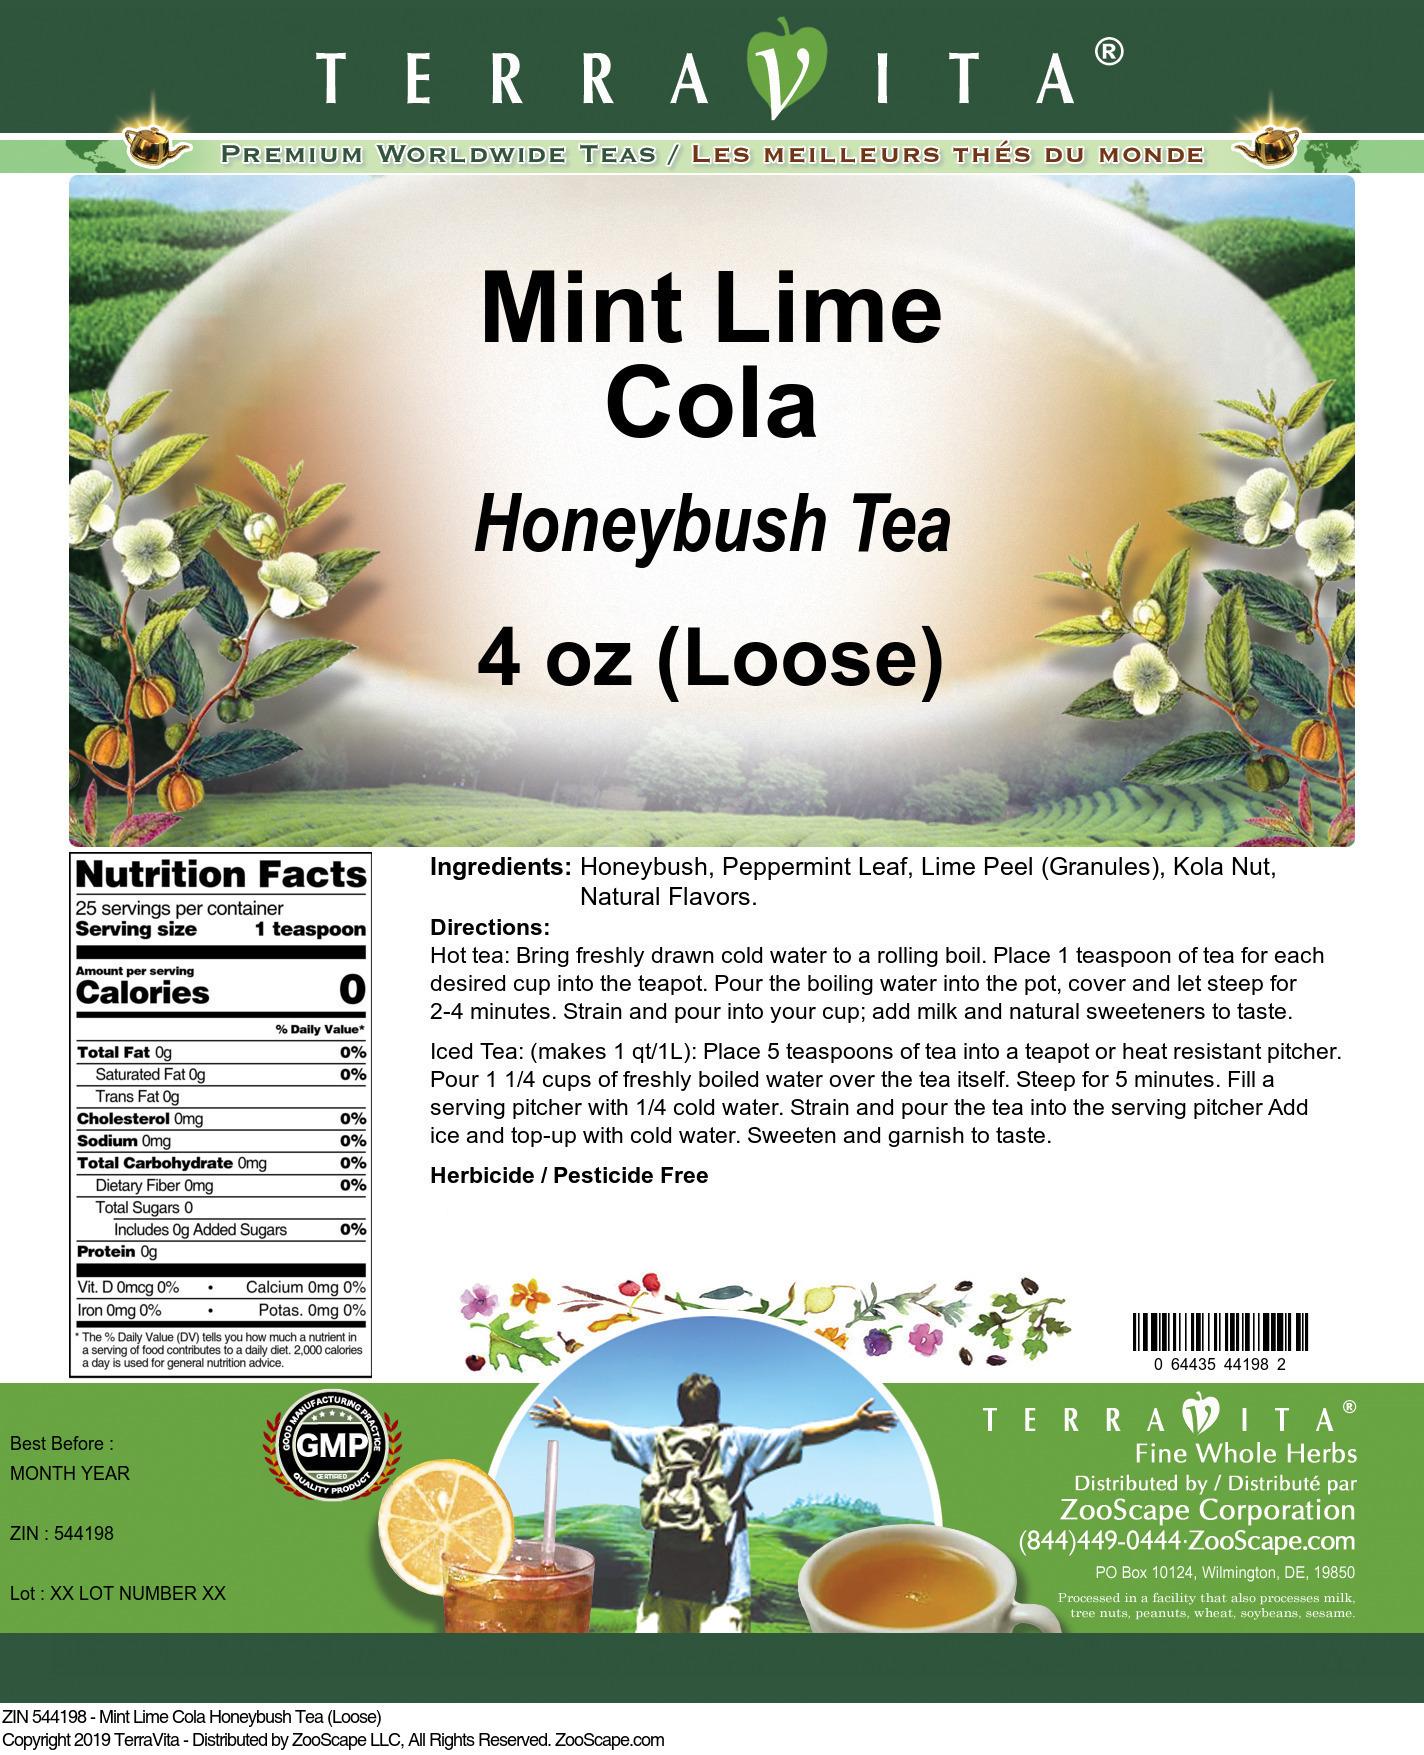 Mint Lime Cola Honeybush Tea (Loose)